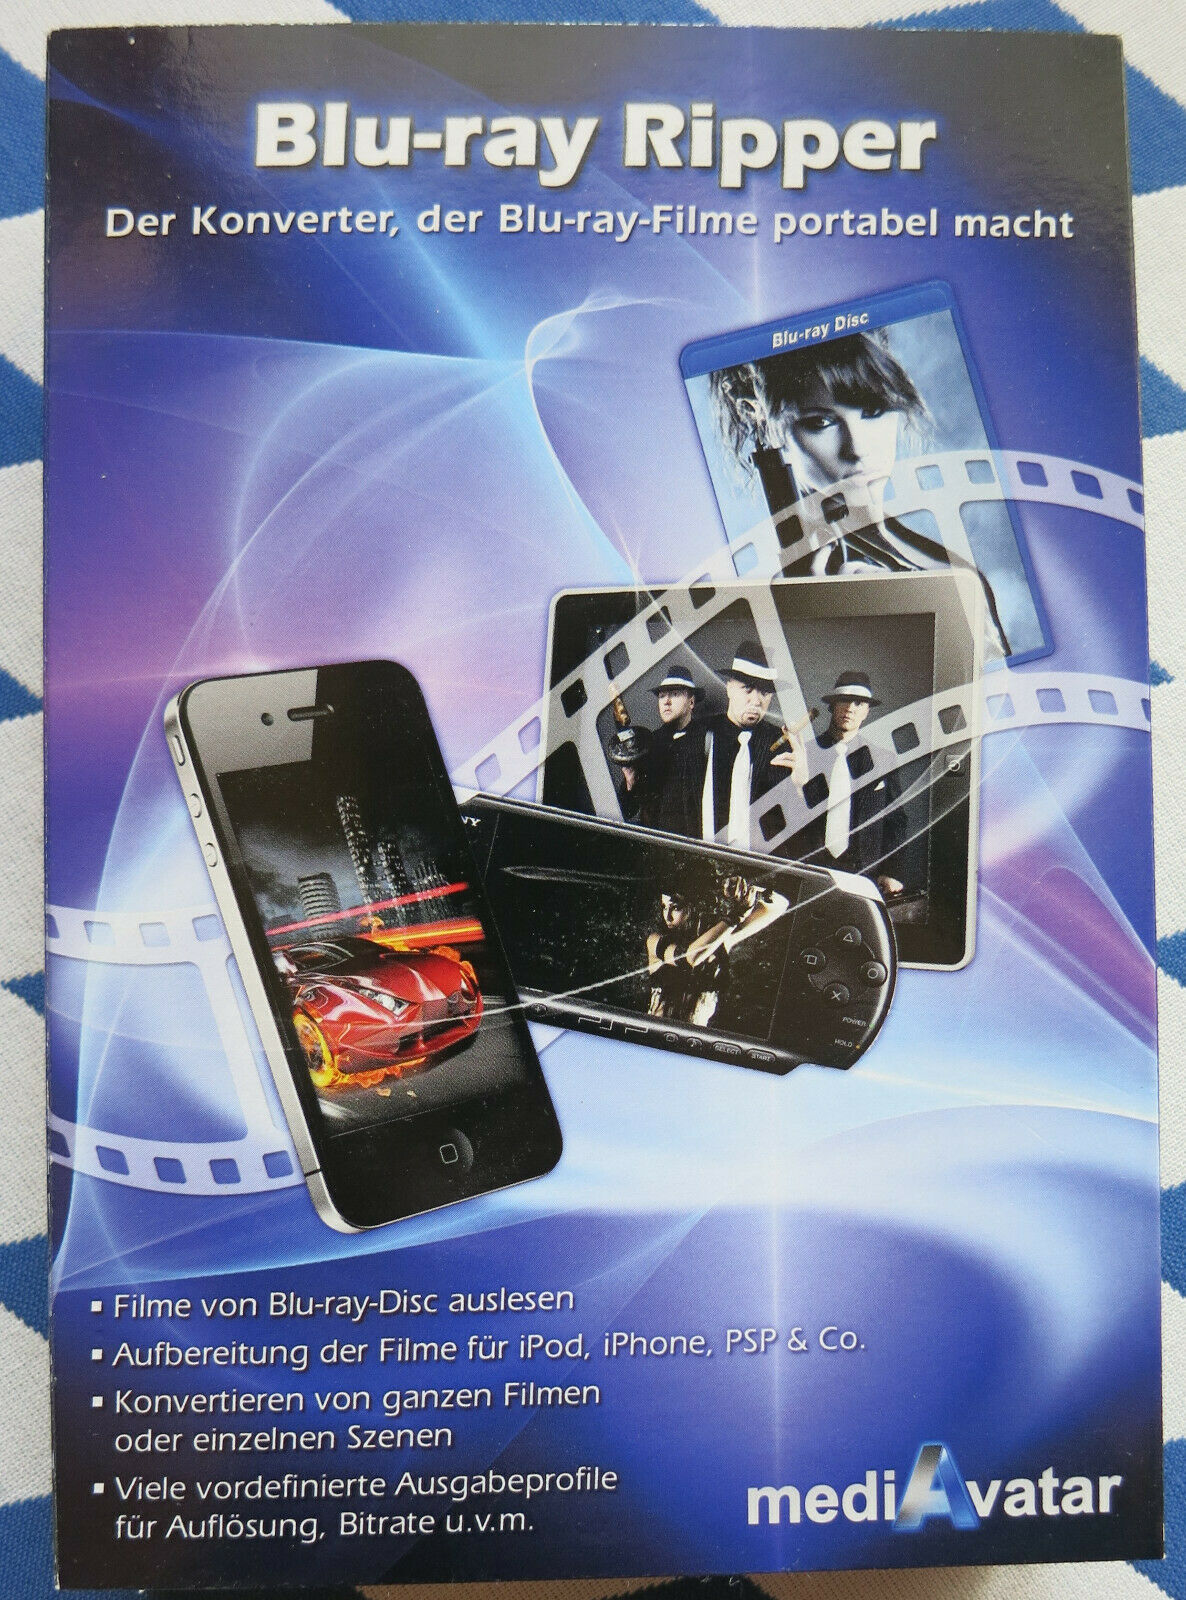 Blu-Ray Ripper, Konverter, mediavatar, Xillisoft - NEU & OVP